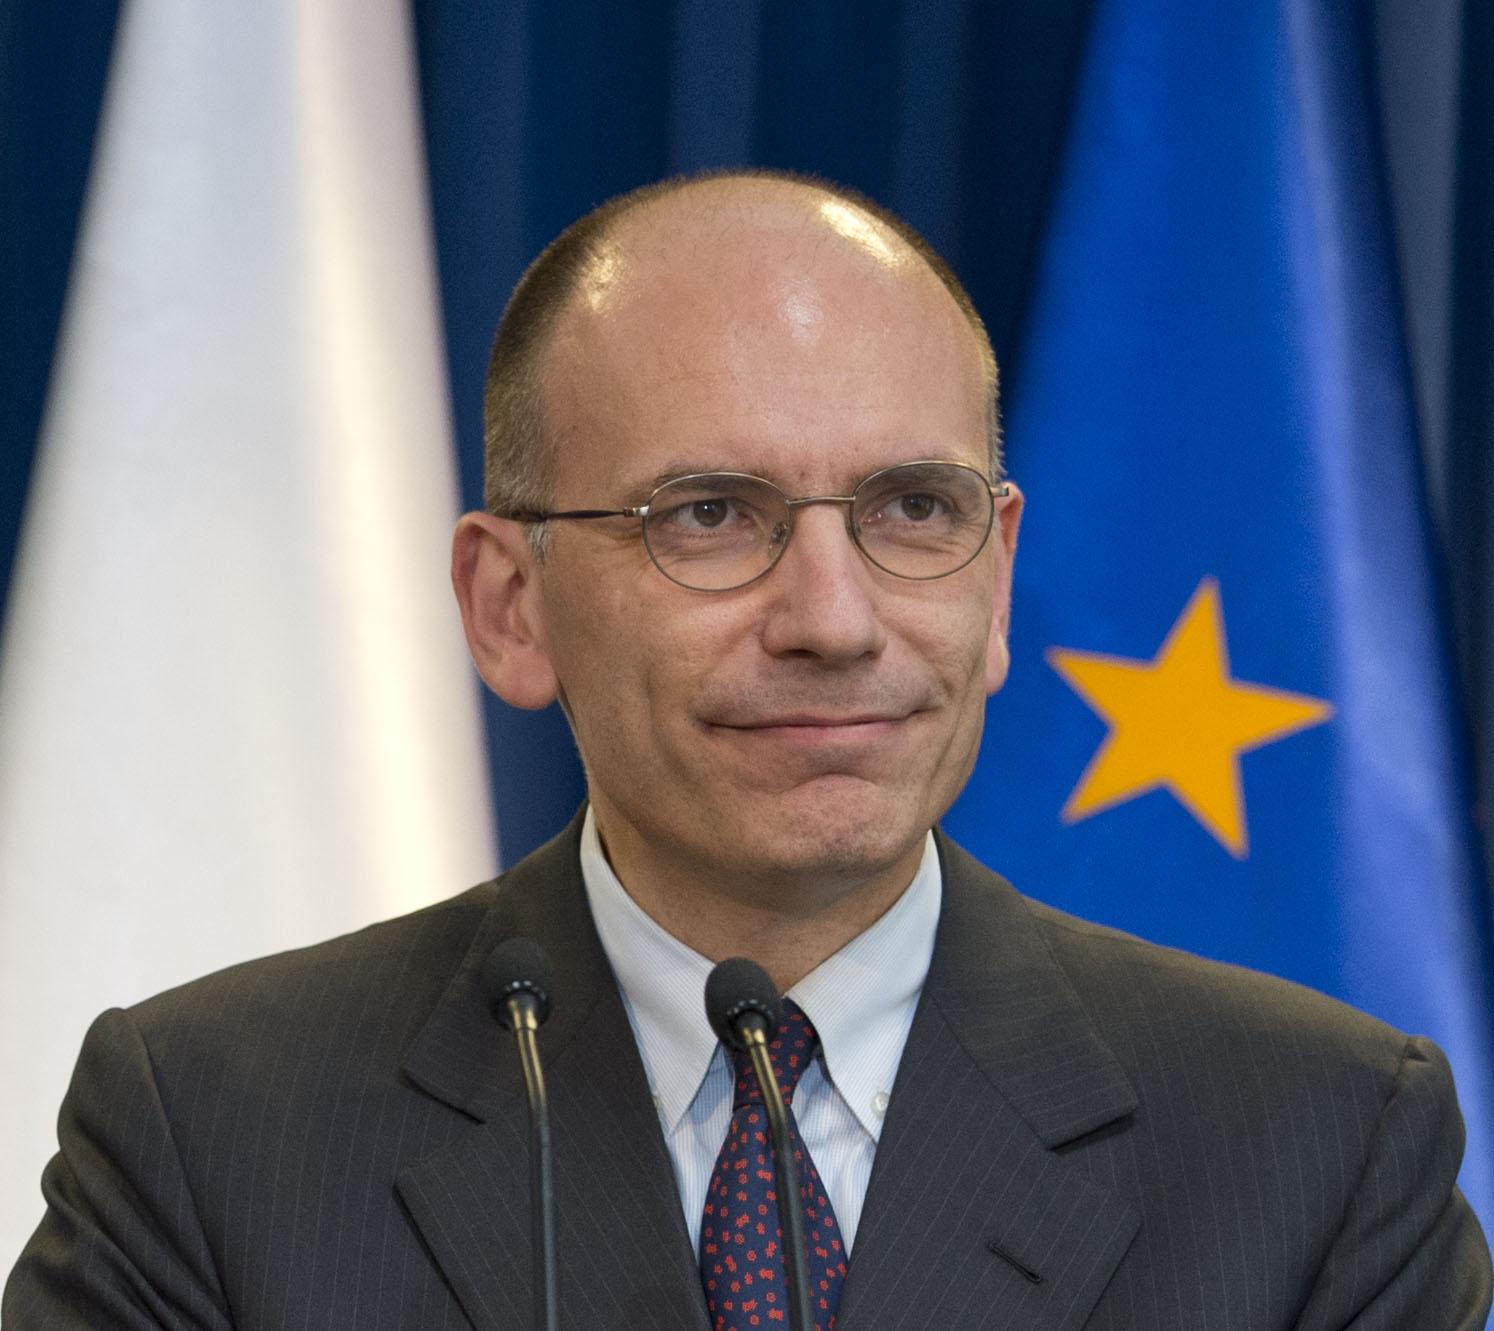 Letta Enrico